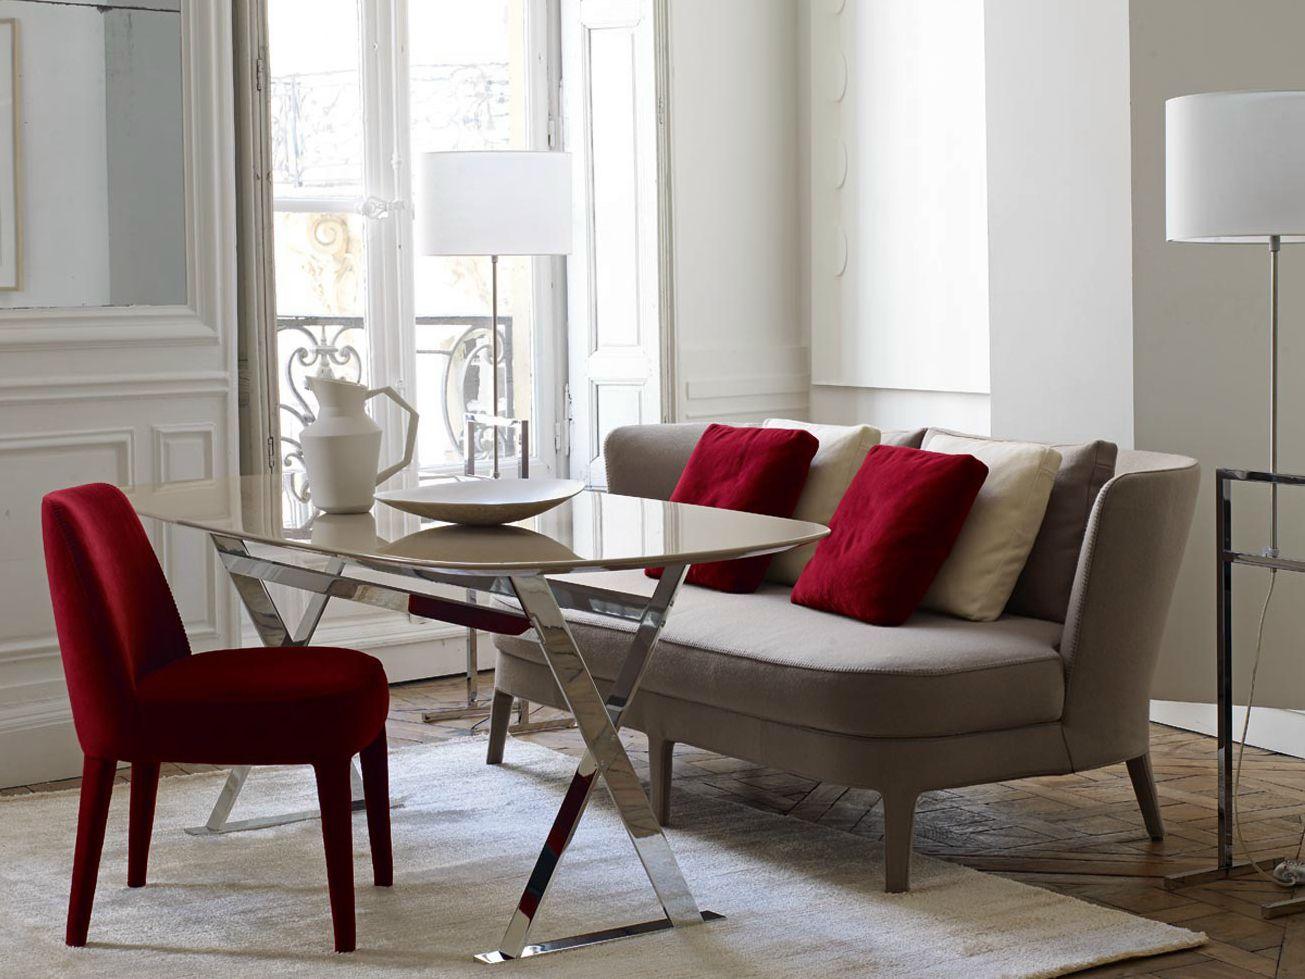 Febo 2 seater sofa by maxalto a brand of b b italia spa for B b italia spa